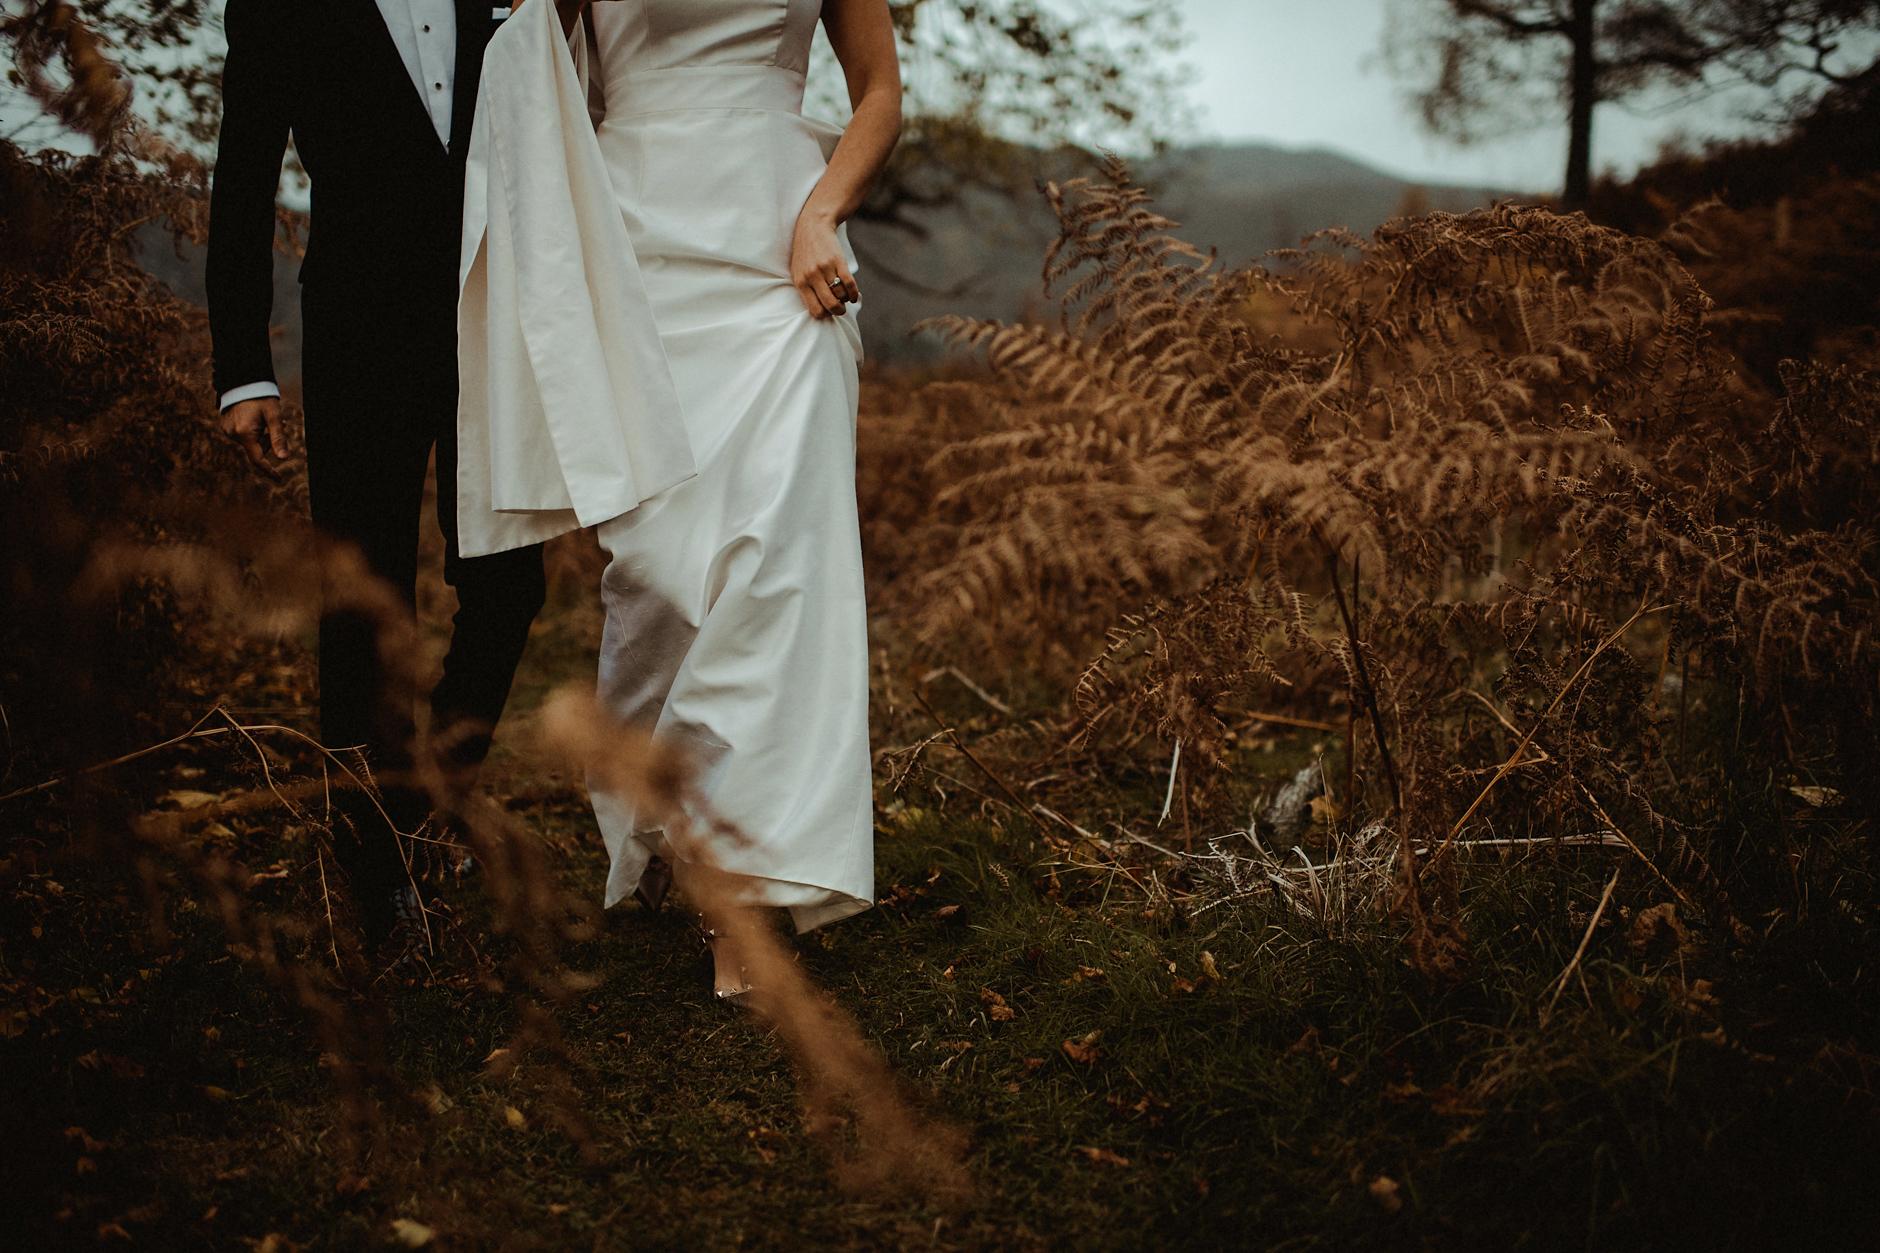 Glentruim-Wedding-Nikki-Leadbetter-Photography-188.jpg